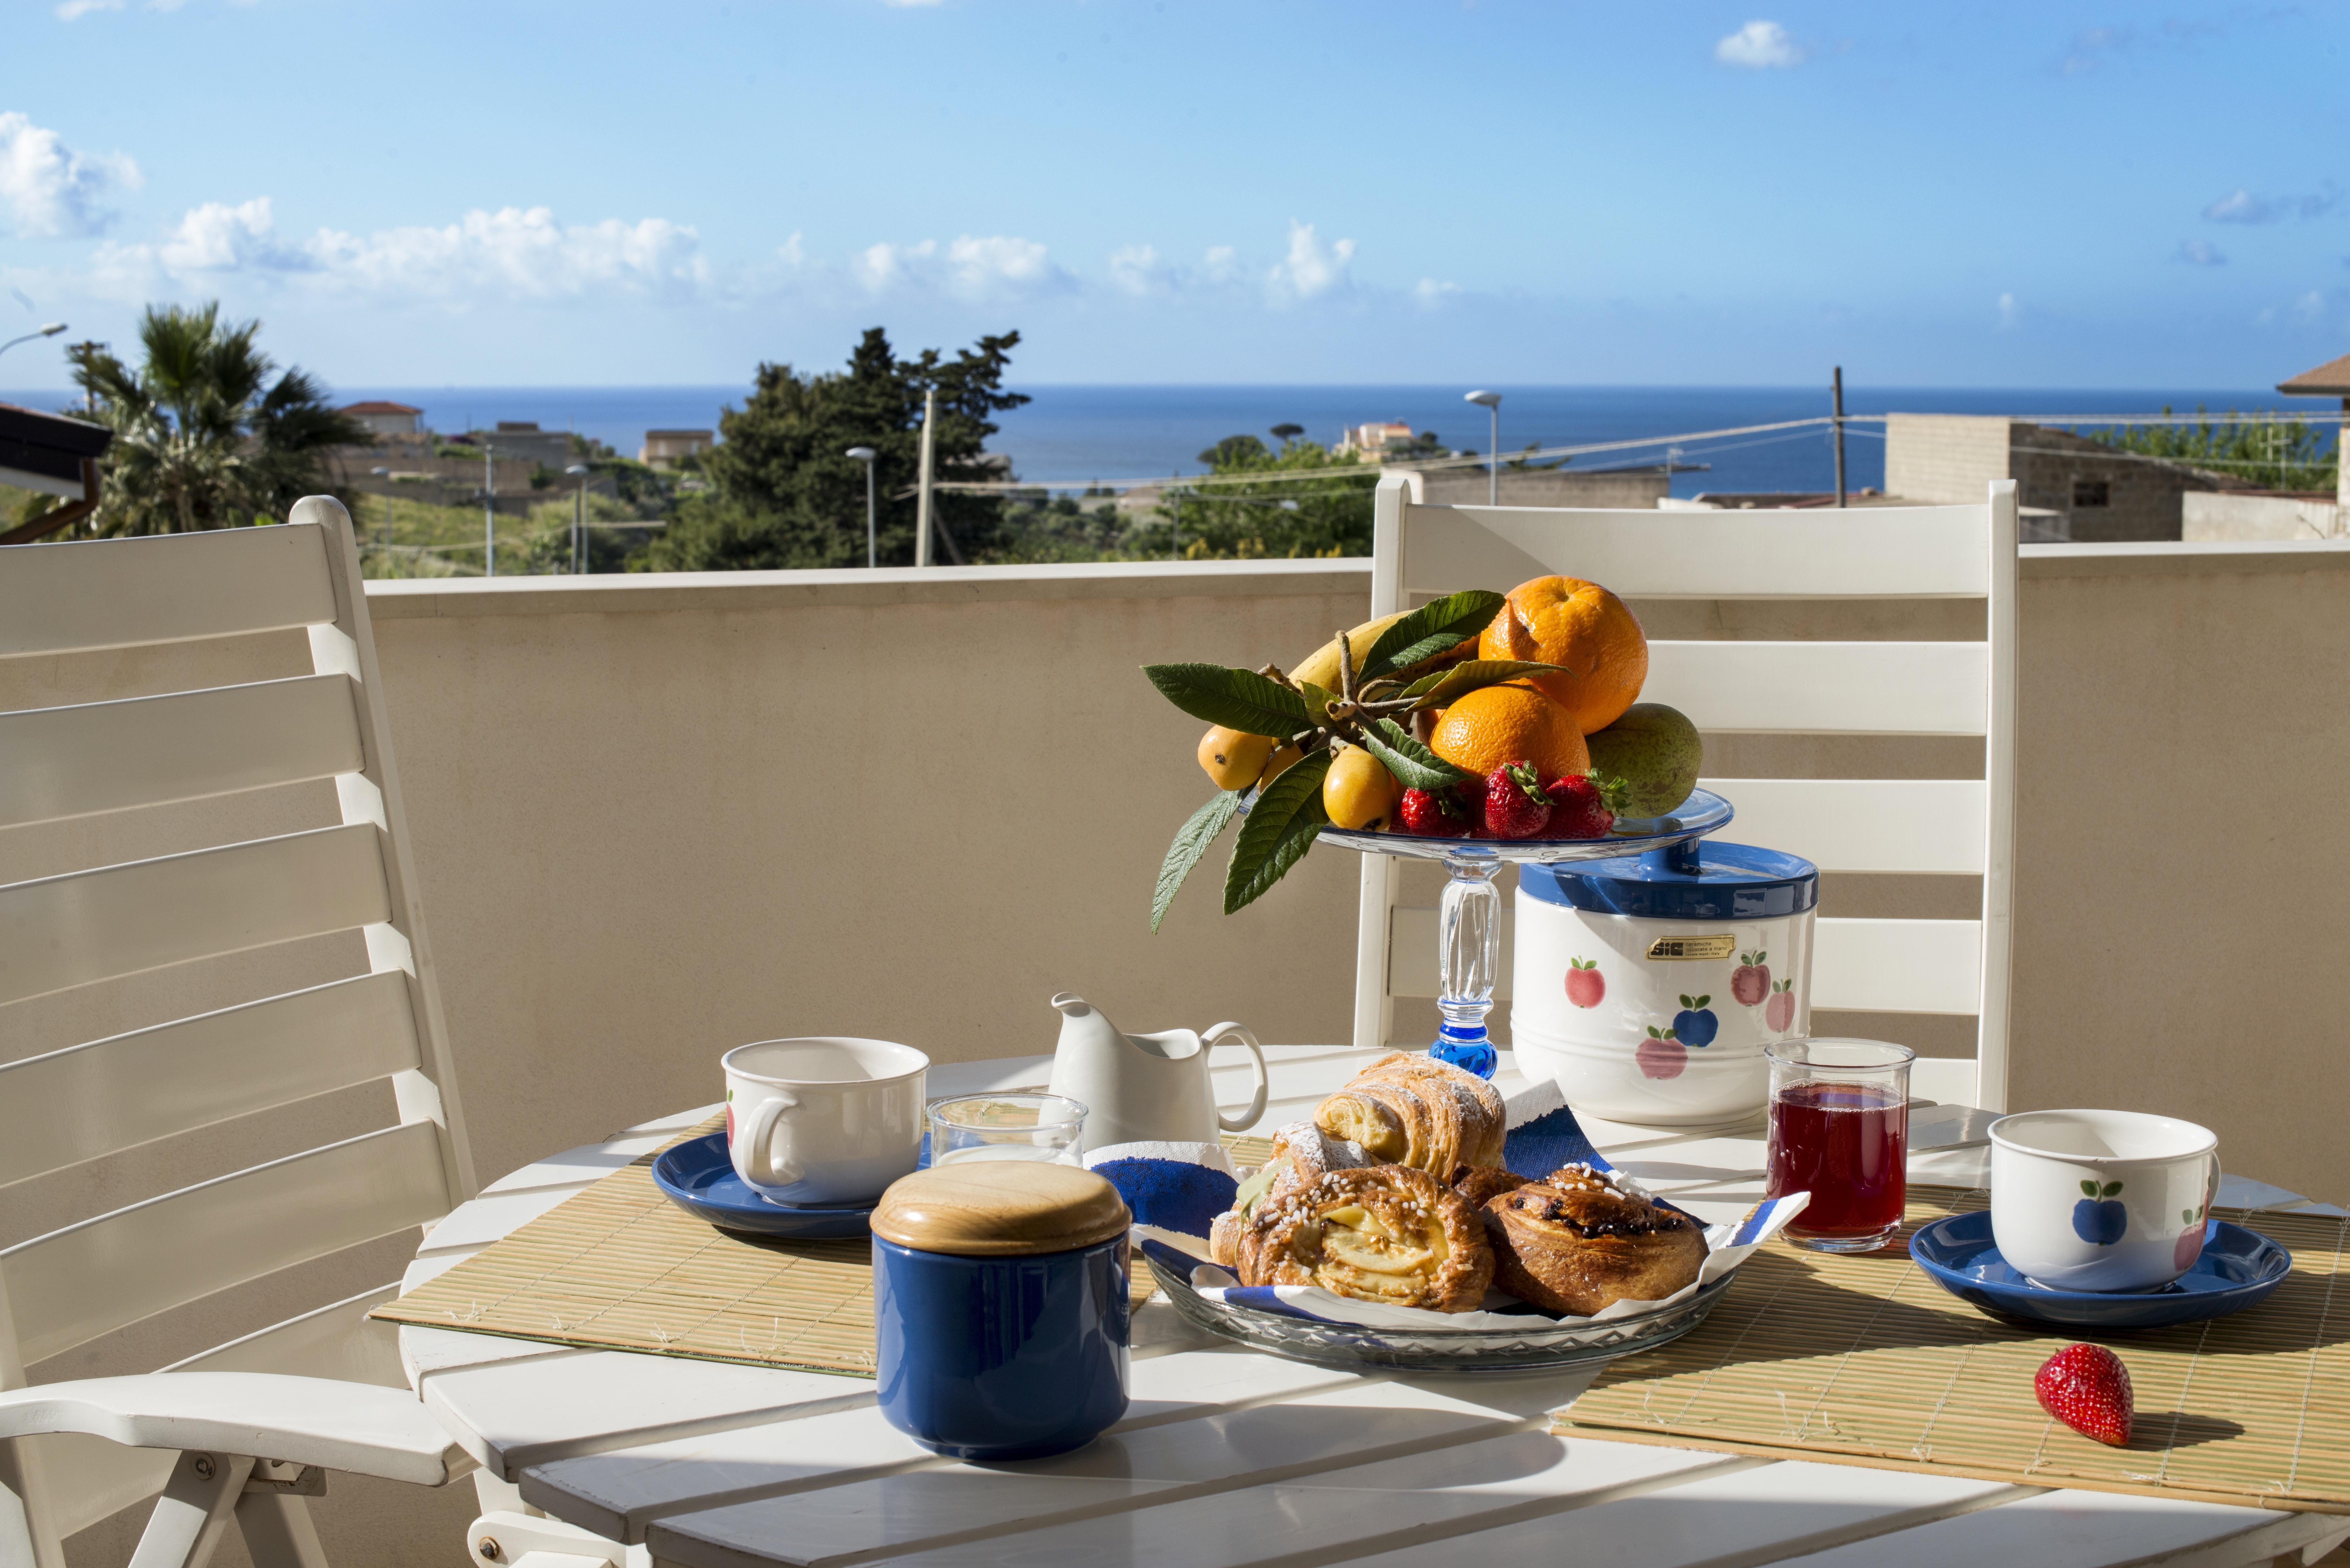 Holiday house Villa Scampati 7 Plätze am Meer mit Garten, Grill und Parkplatz (2388901), Alcamo, Trapani, Sicily, Italy, picture 3